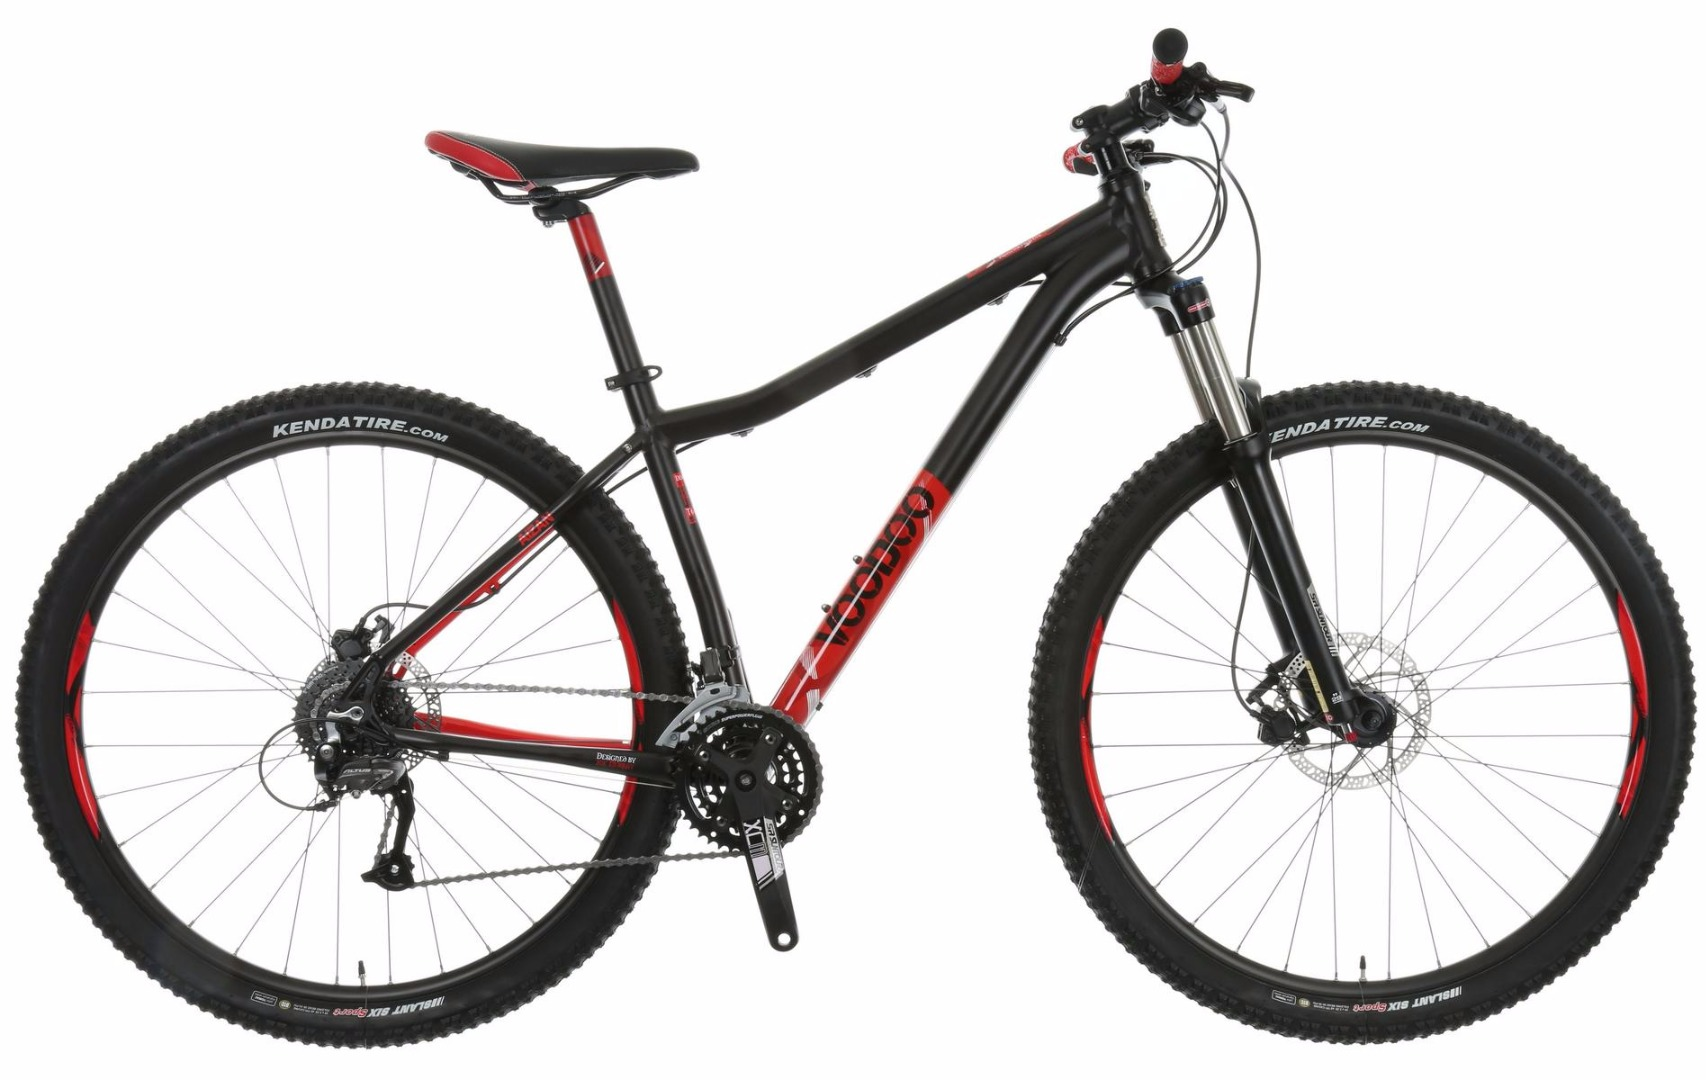 Stolen Voodoo Aizan 29er Mountain Bike